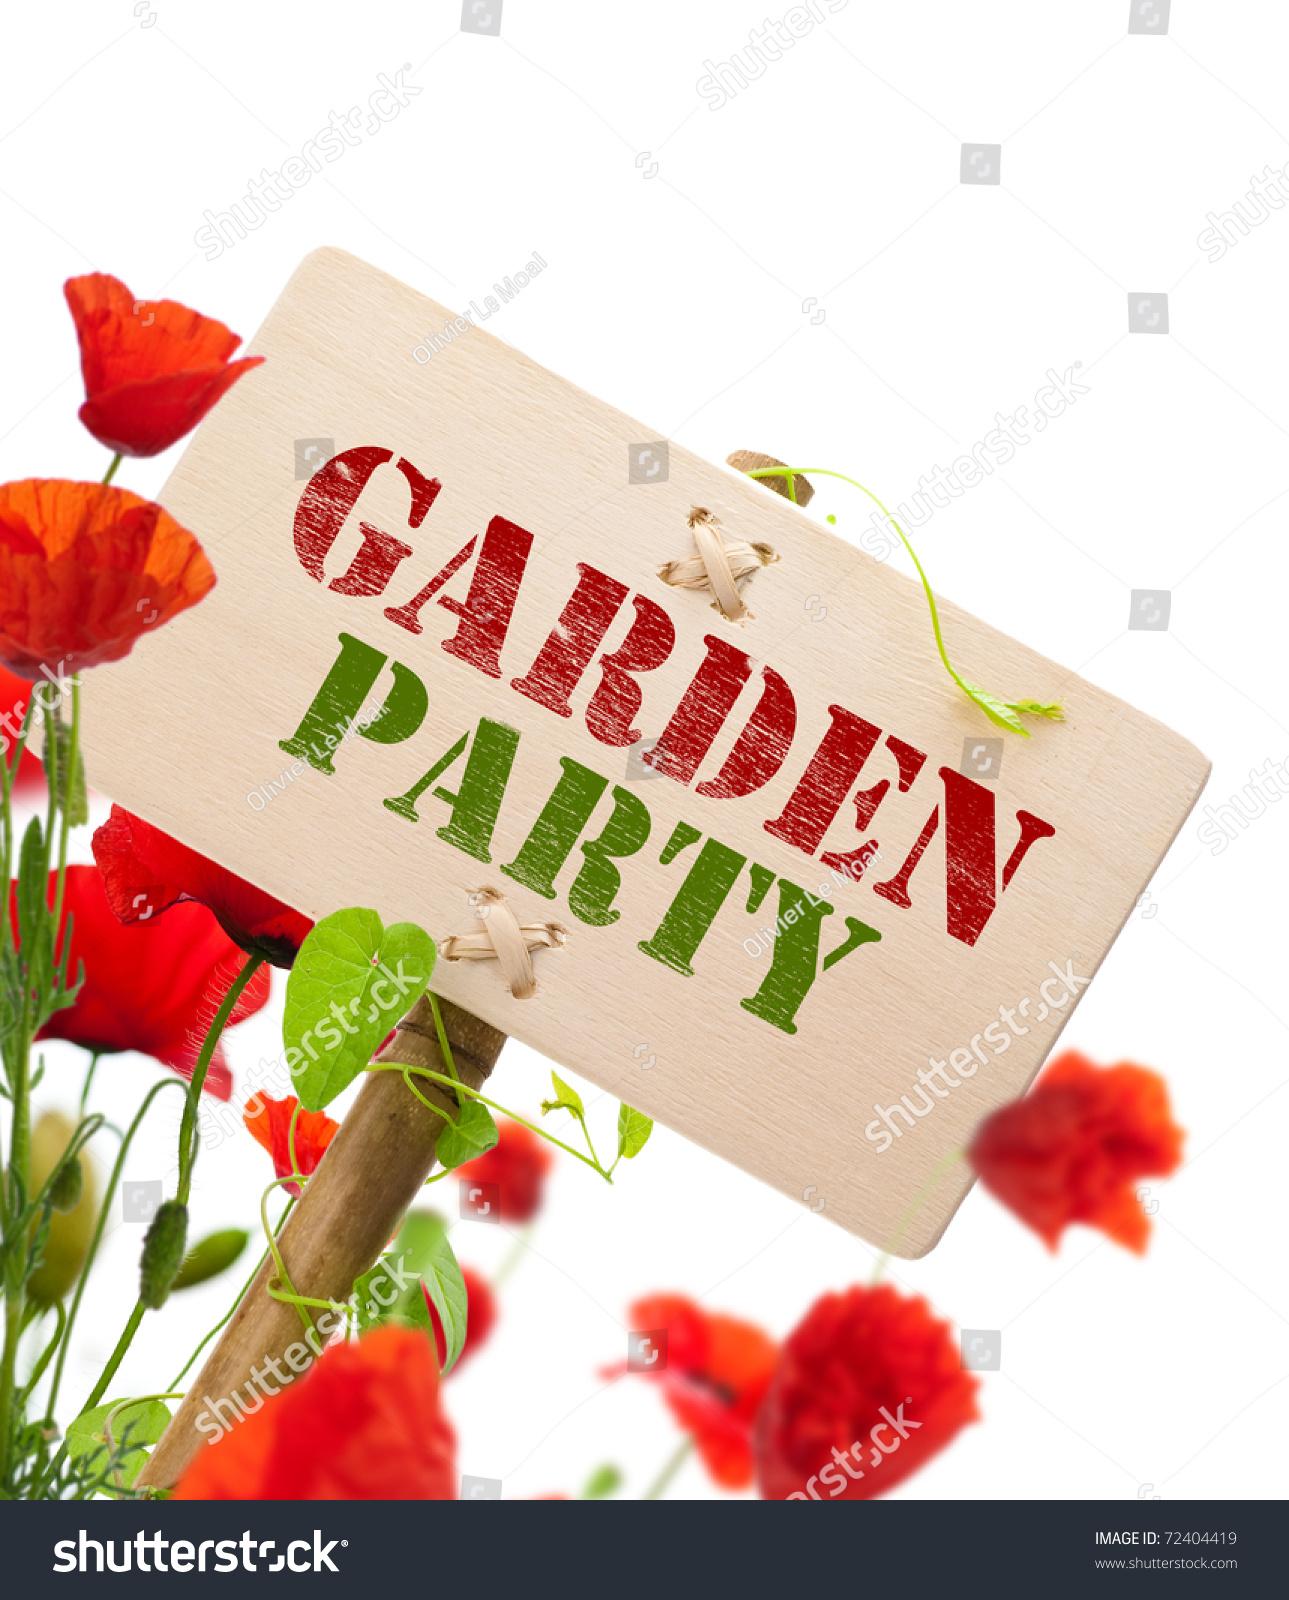 the garden celebration symbols